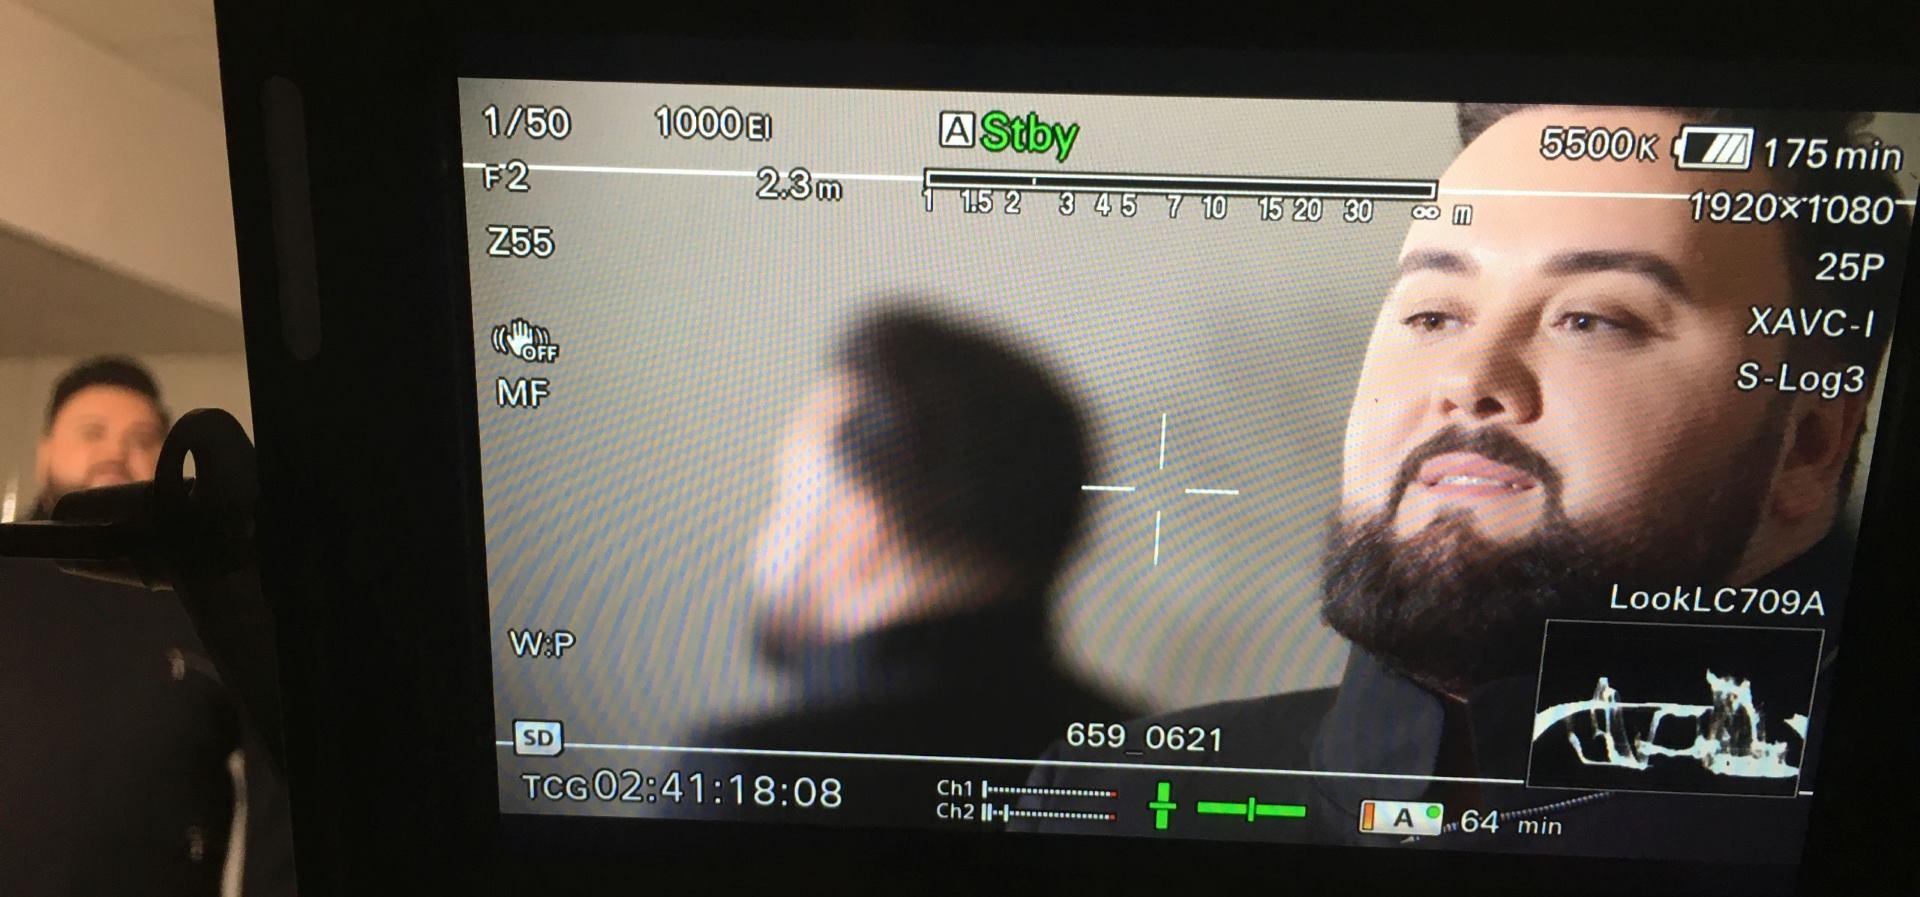 FOTO: Katja Restović režira spot Jacquesa Houdeka za pjesmu 'My friend'